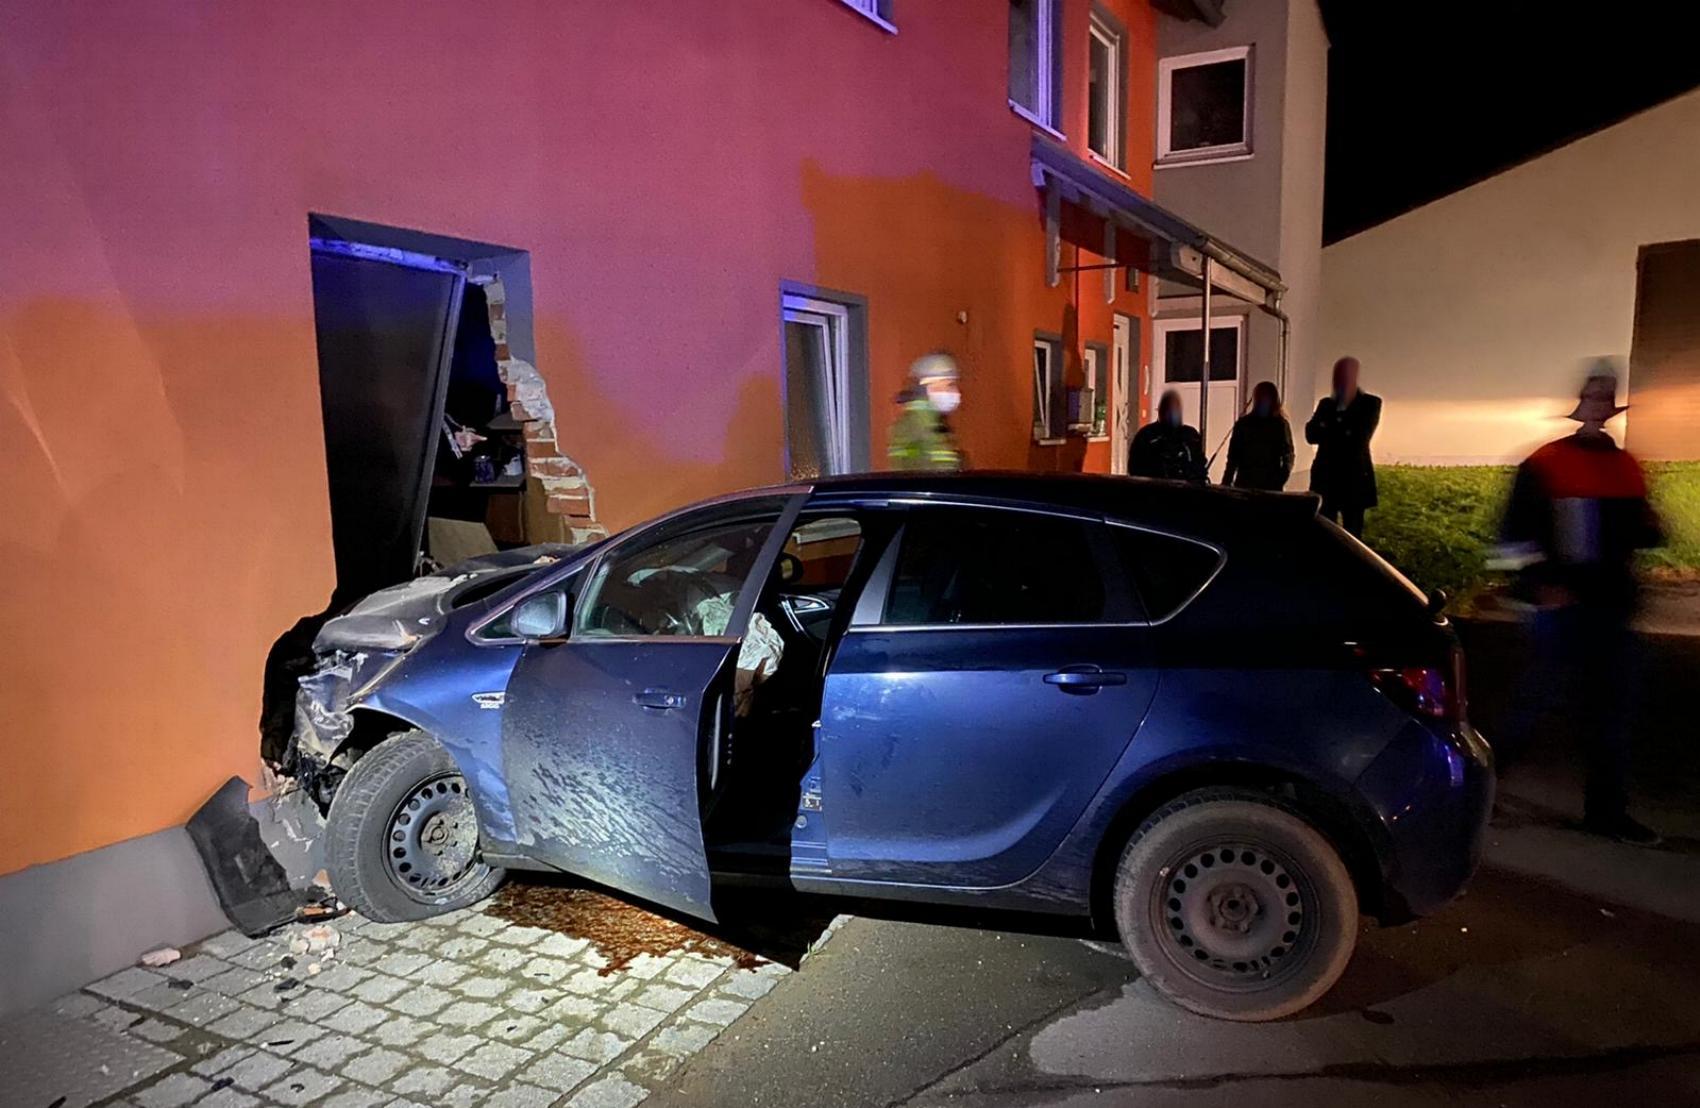 Uttenhofen Pkw Hauswand Unfall